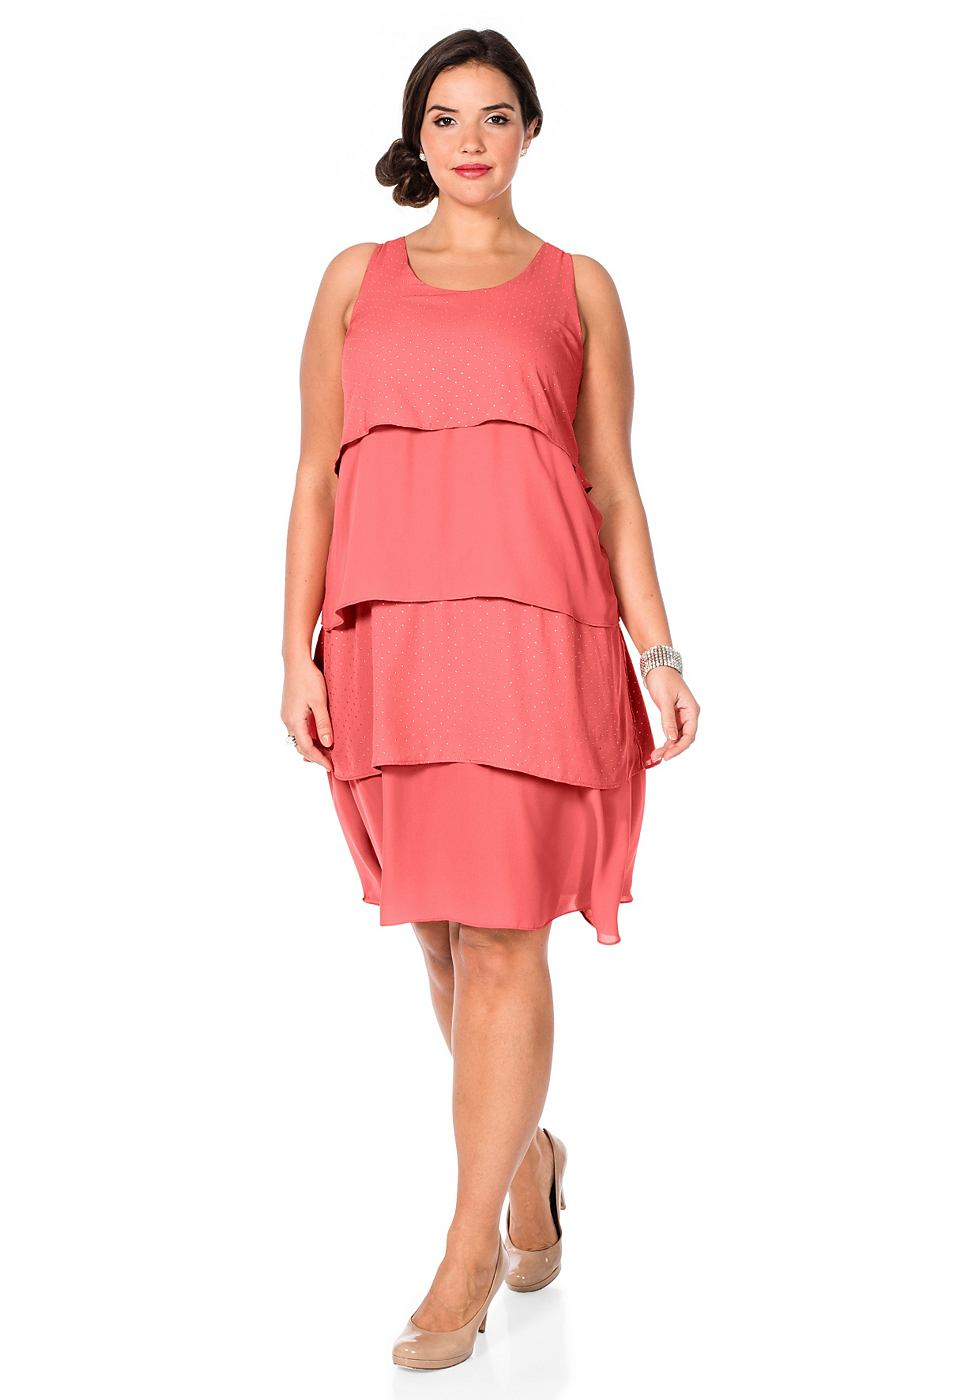 Sheego Style jurk roze